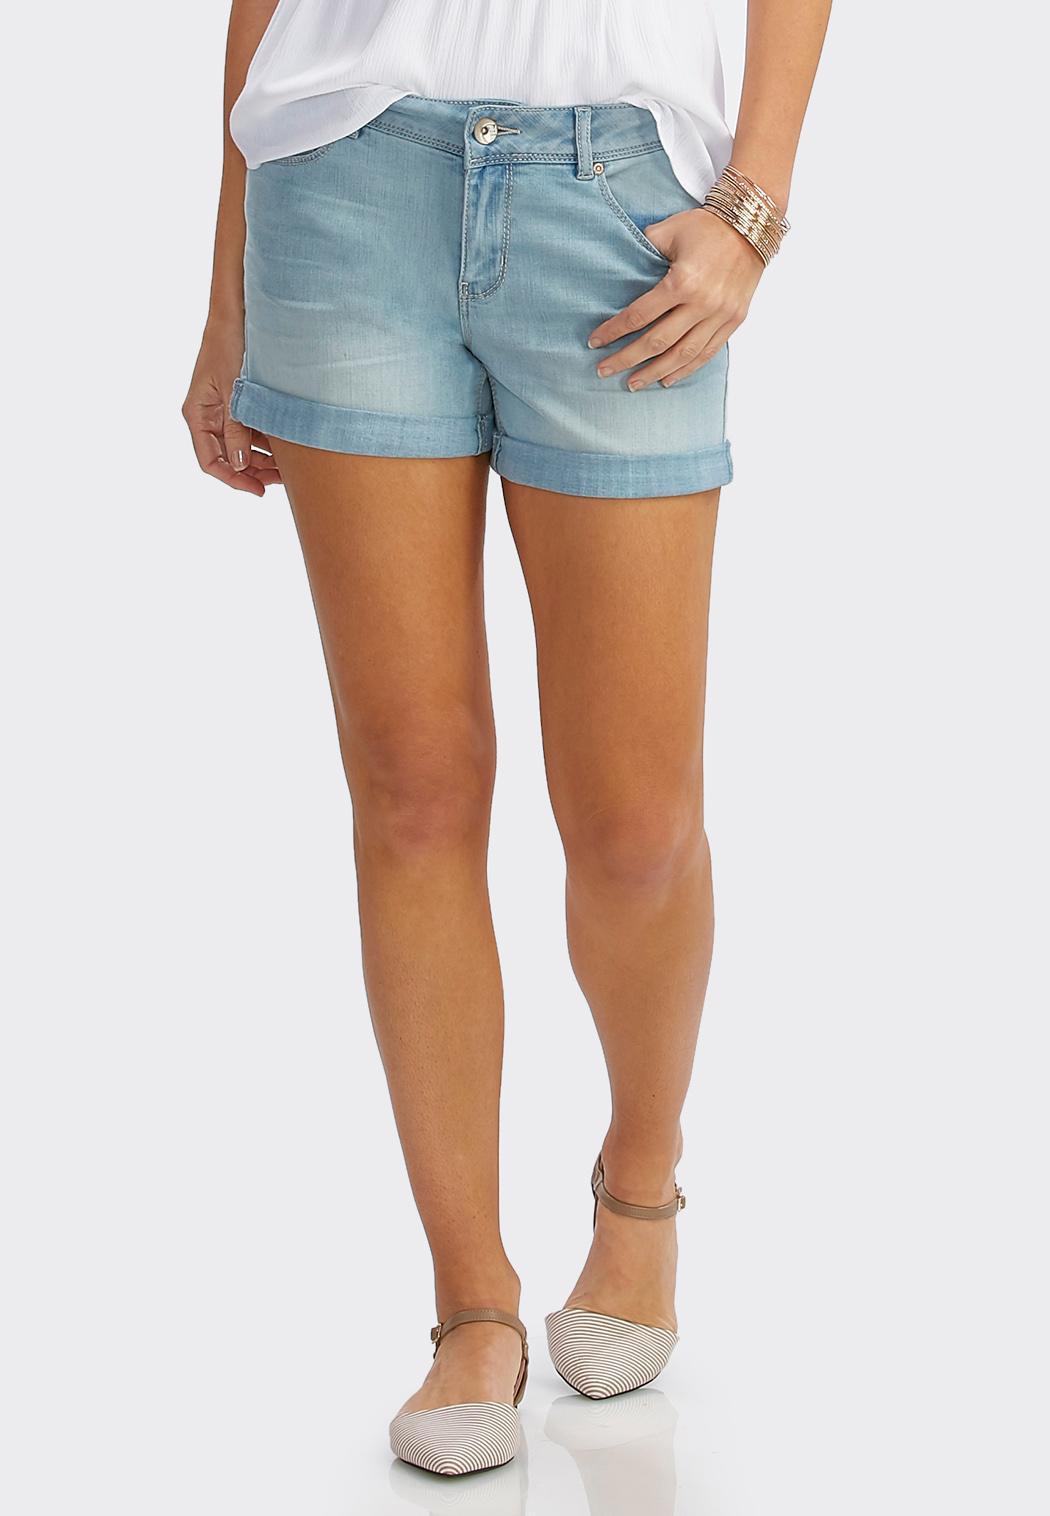 Cuffed Jean Shorts Shorts & Crops Cato Fashions